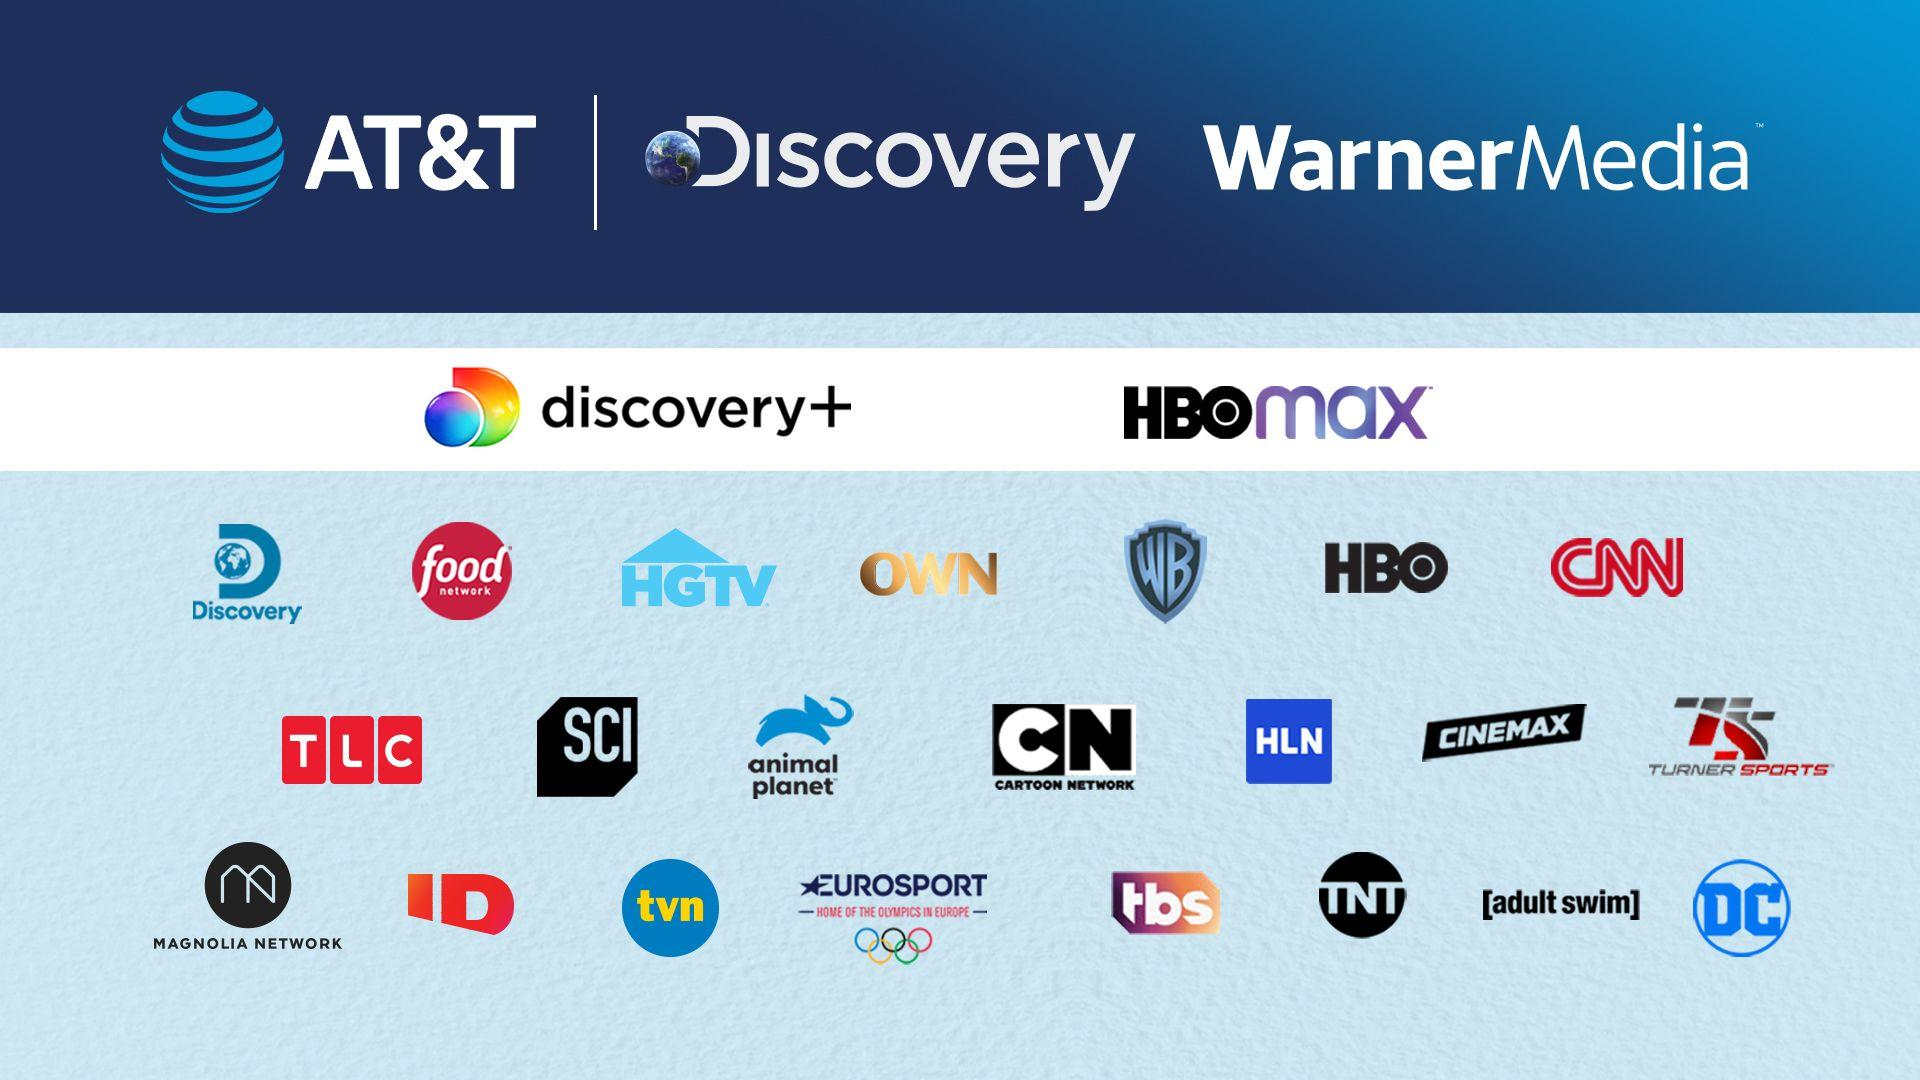 WarnerMedia + Discovery